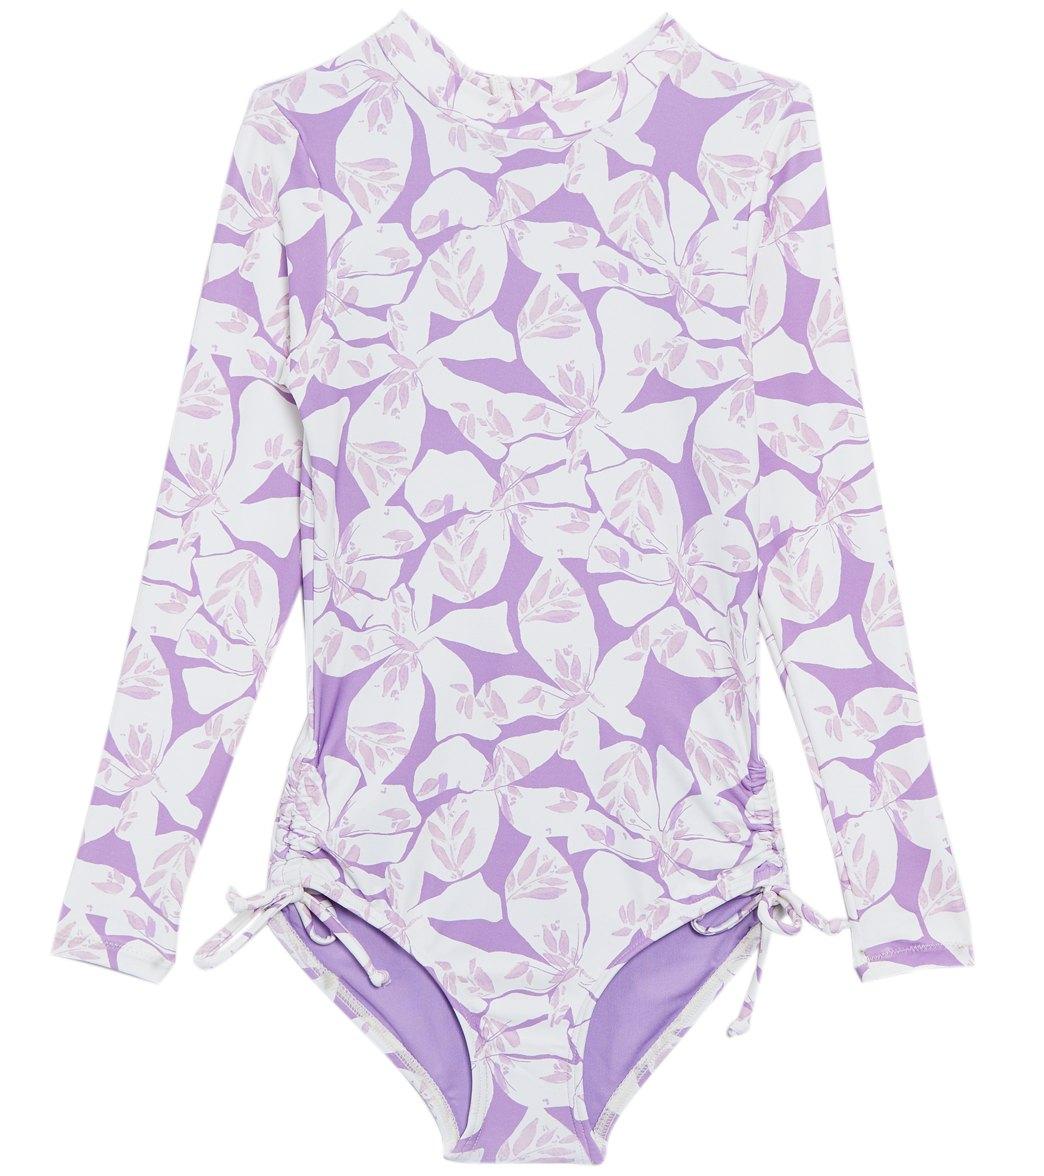 80b821e950cb O'Neill Girls' Coryn Long Sleeve One Piece Swimsuit (Little Kid, Big Kid)  at SwimOutlet.com - Free Shipping